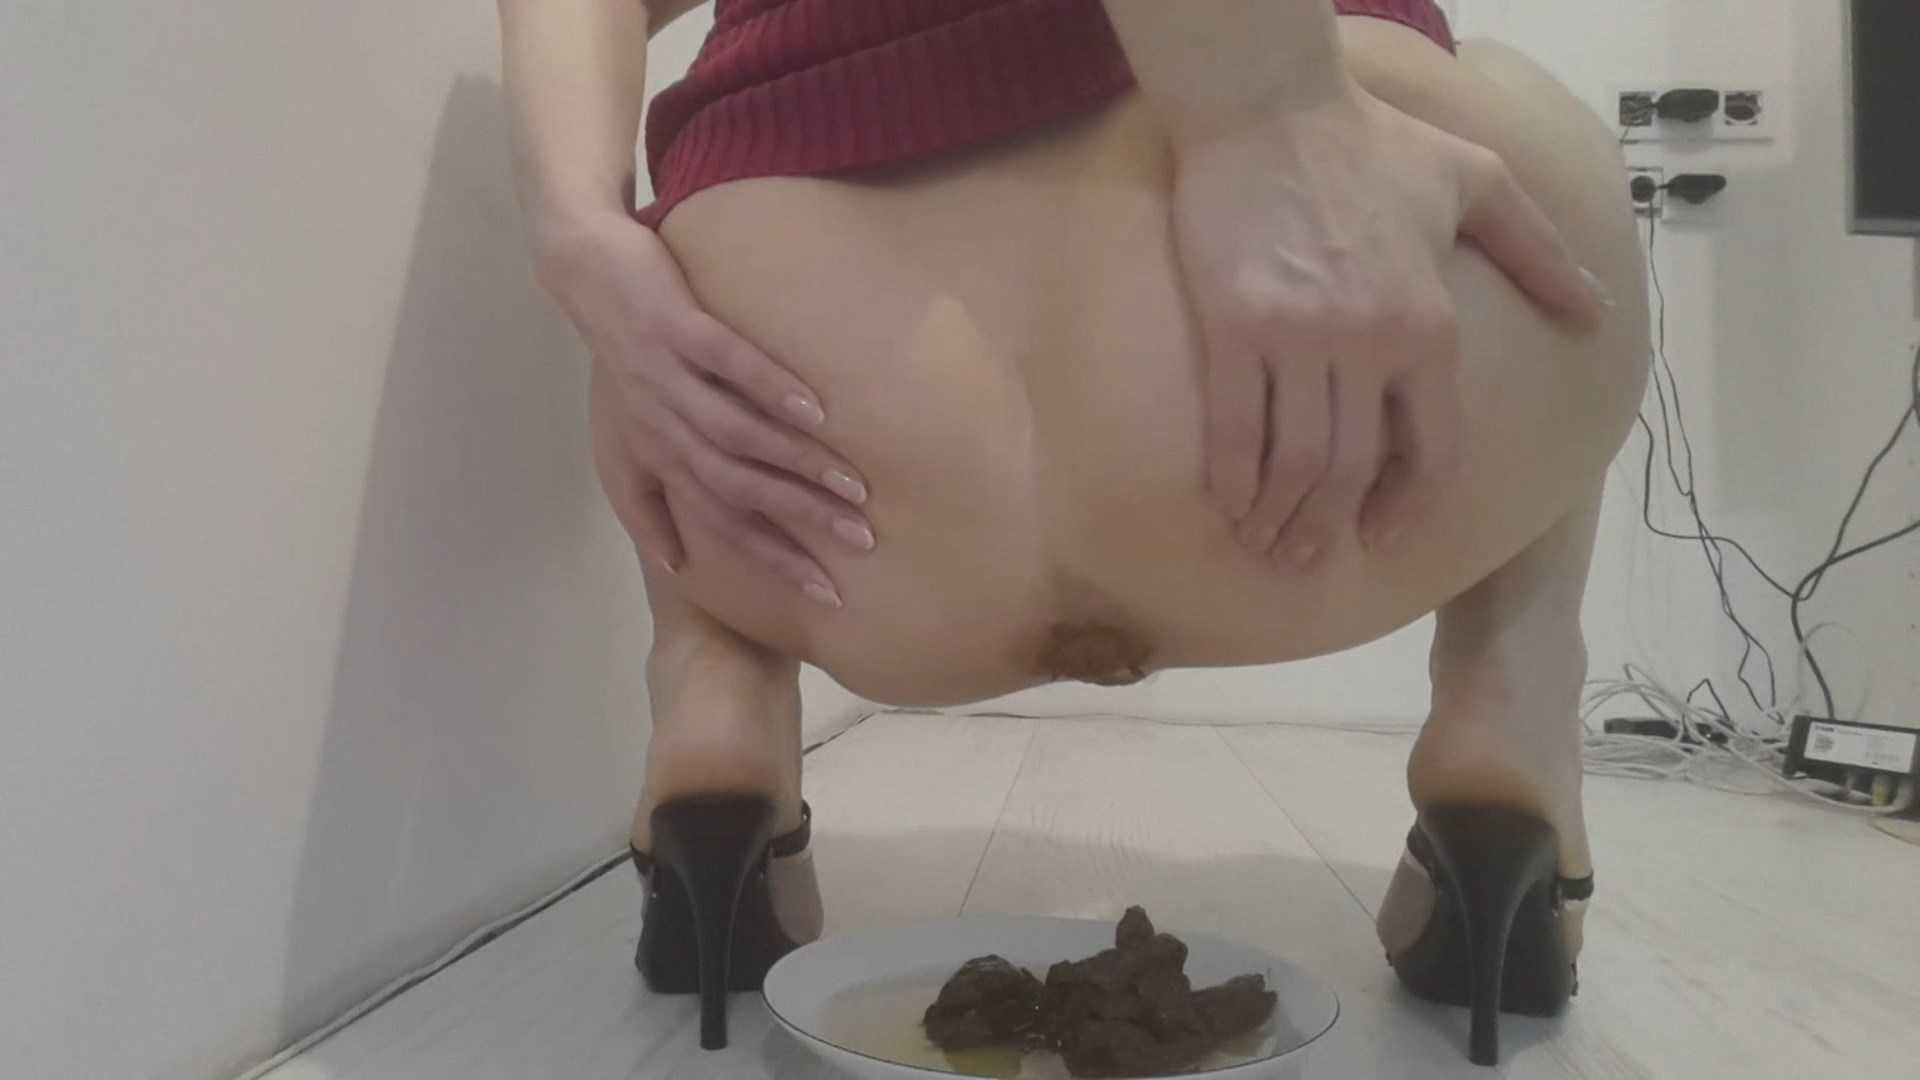 Hot skinny girl pooping — pic 11